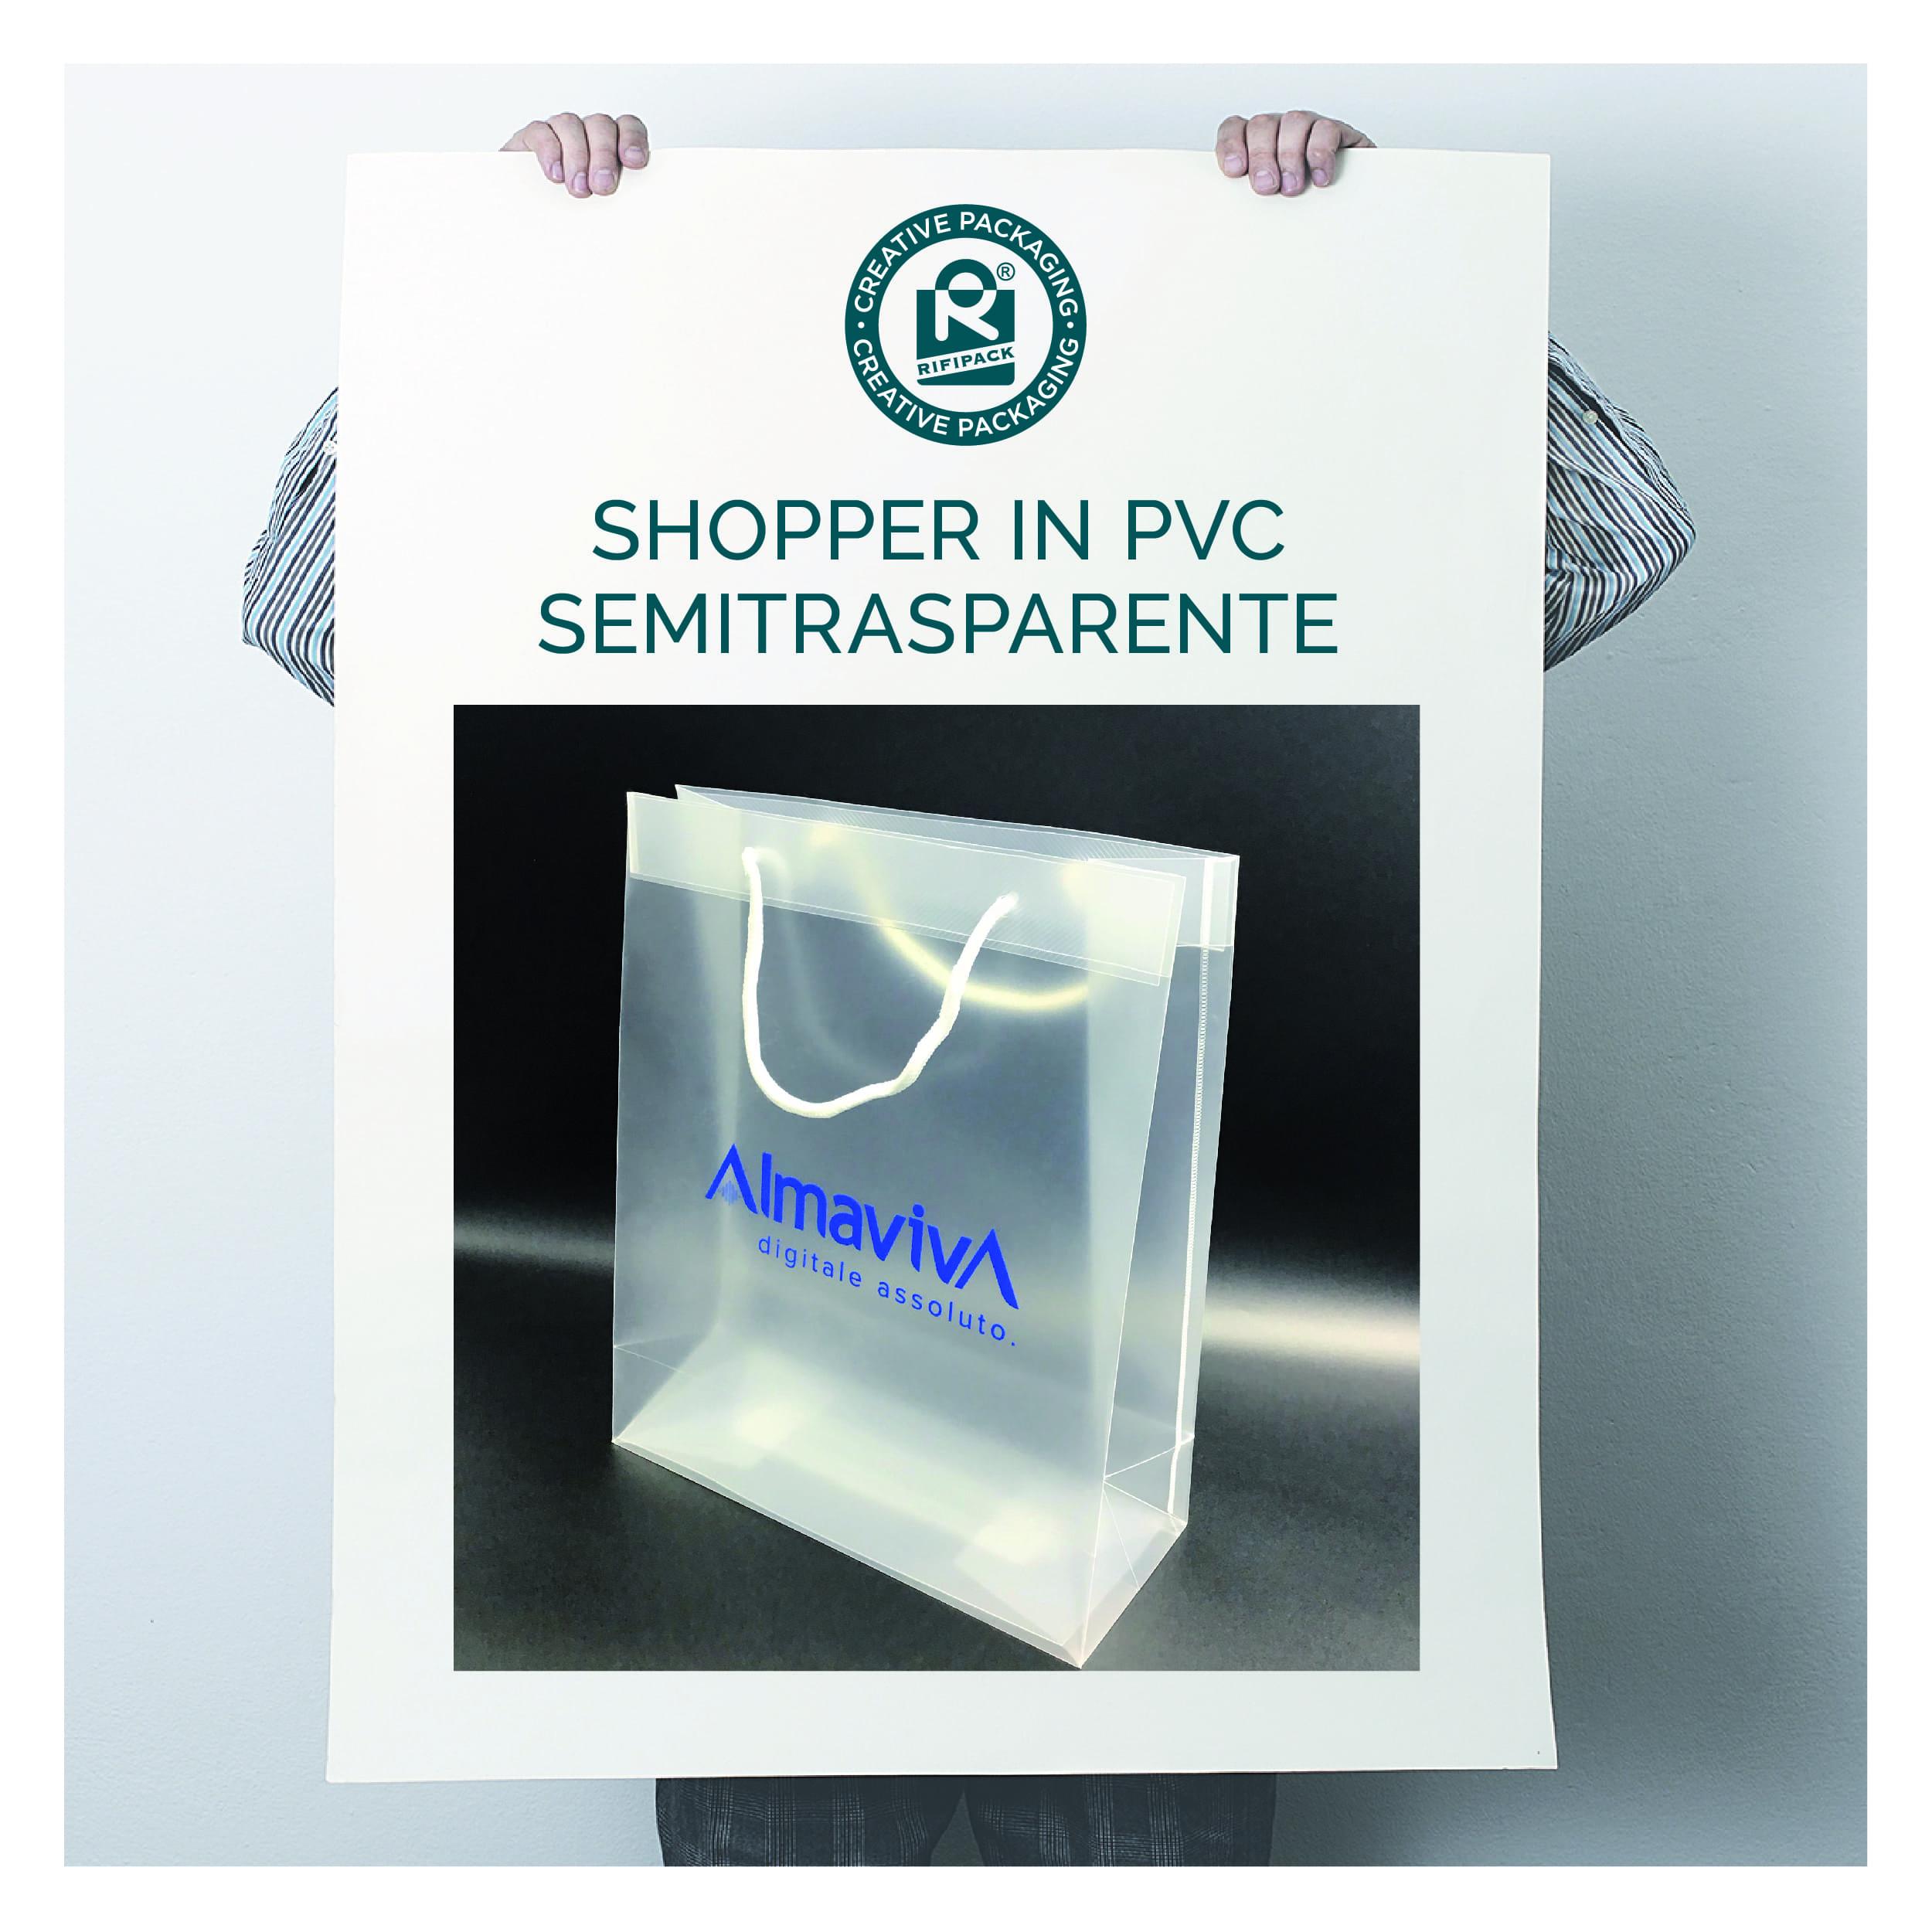 rifipack shopper in pvc semitrasparente